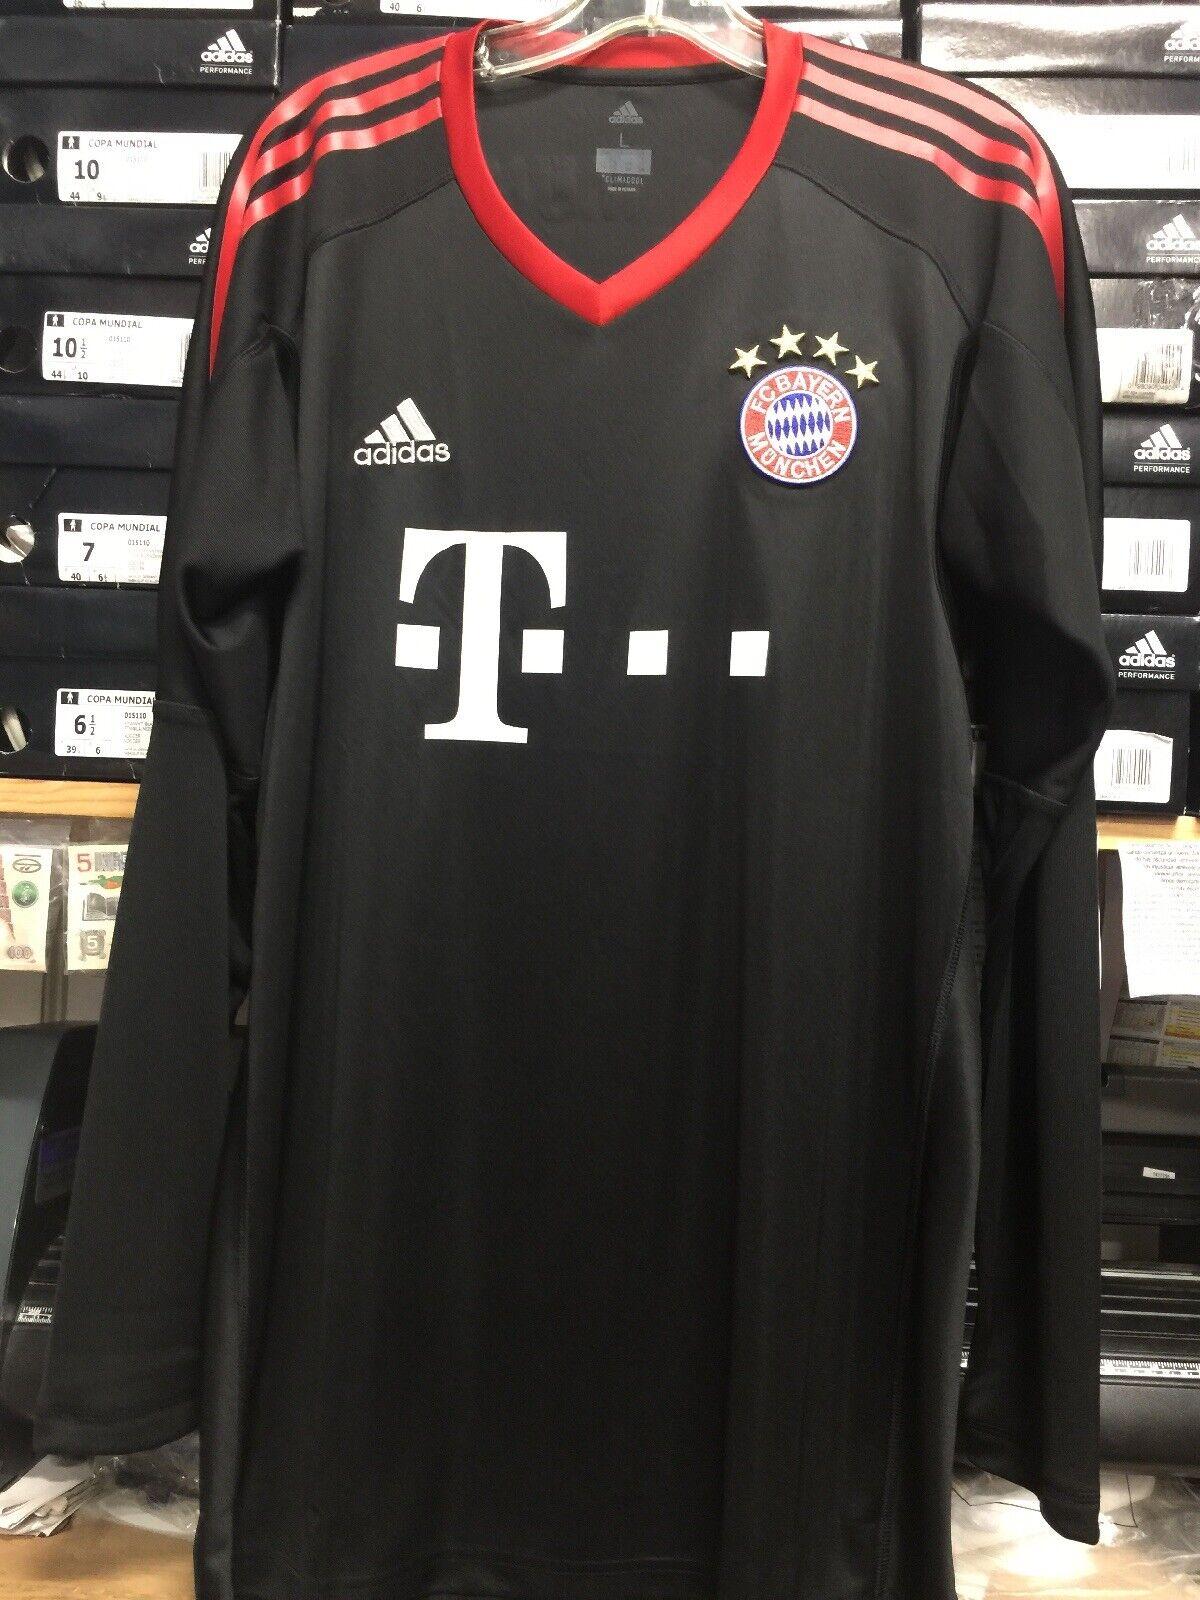 Bayern Munchen Adidas Borsa Holdall Duffle Tg Red Team Bag 2018 19 For Sale Online Ebay